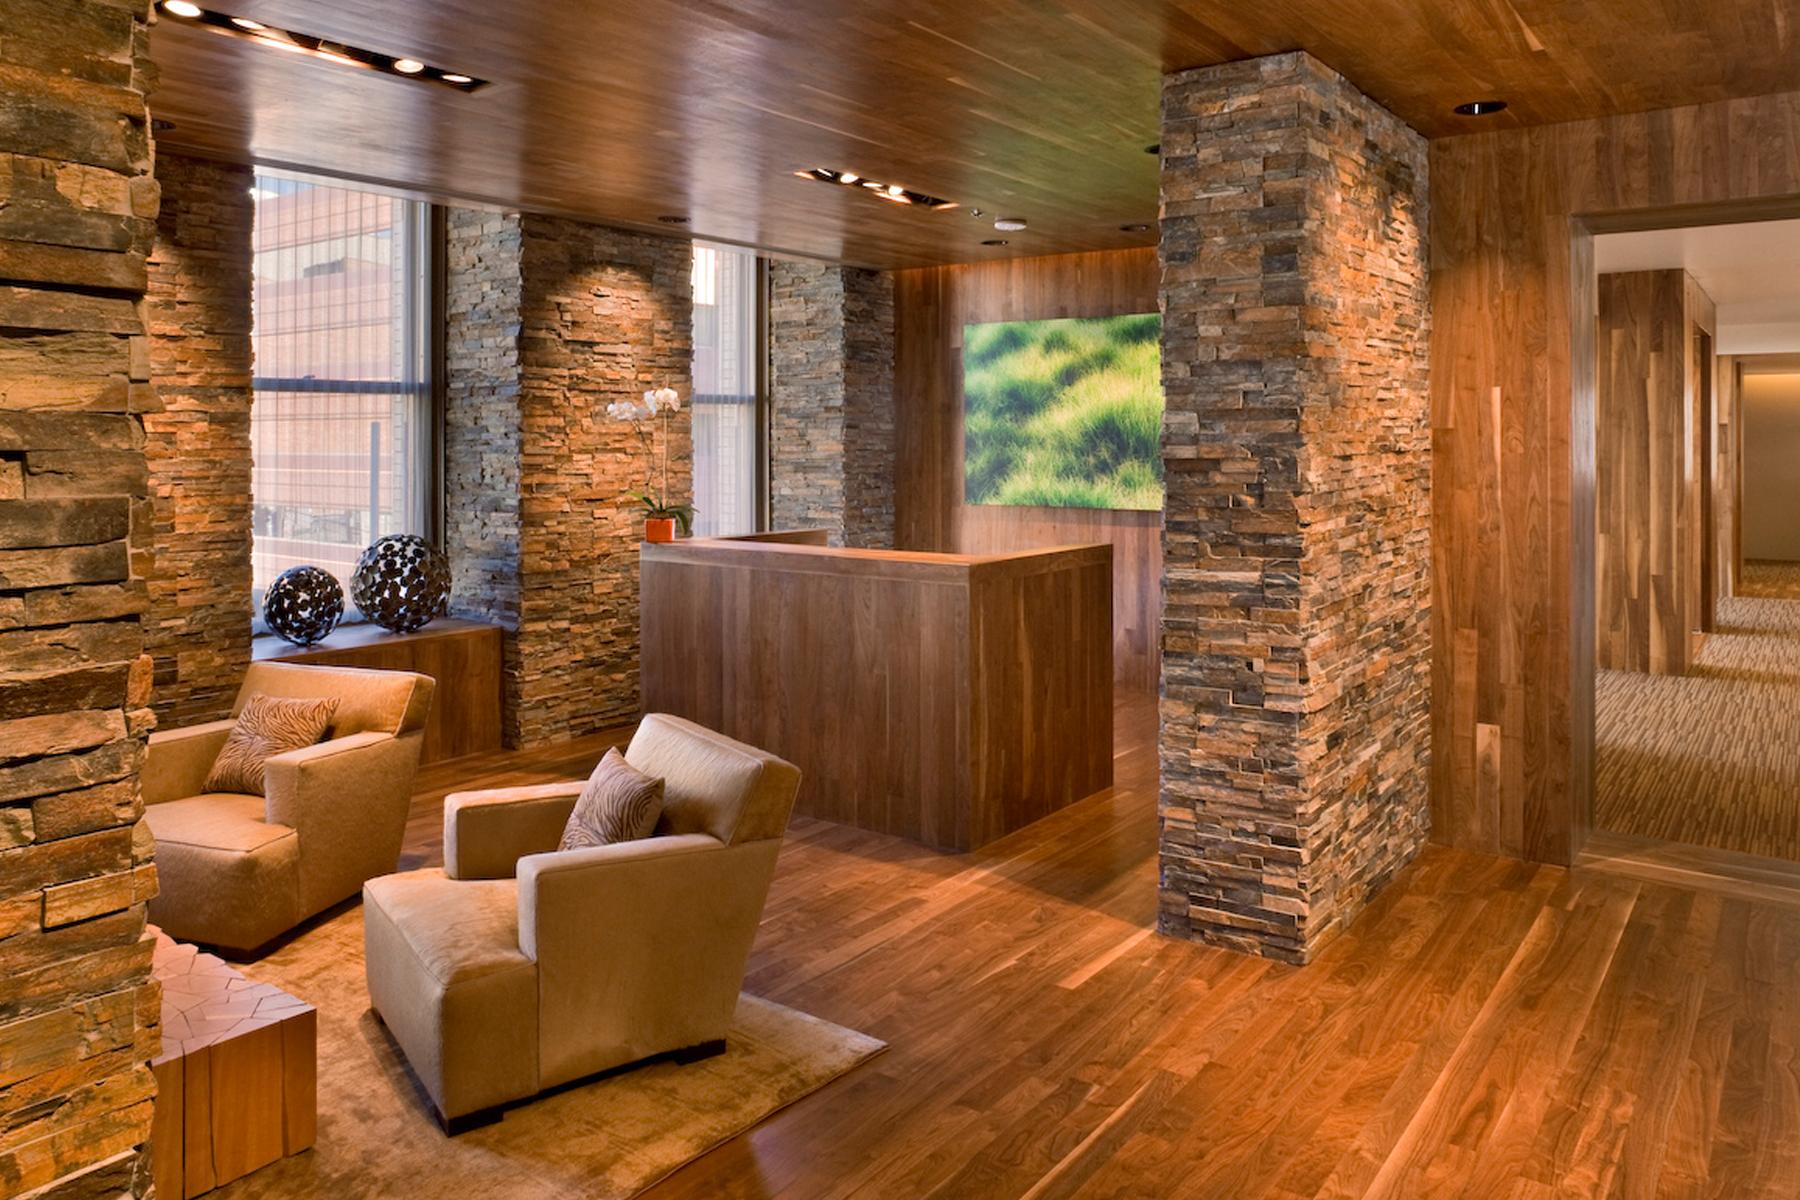 Denver Office Renovation, Colorado- Jordy Construction 2